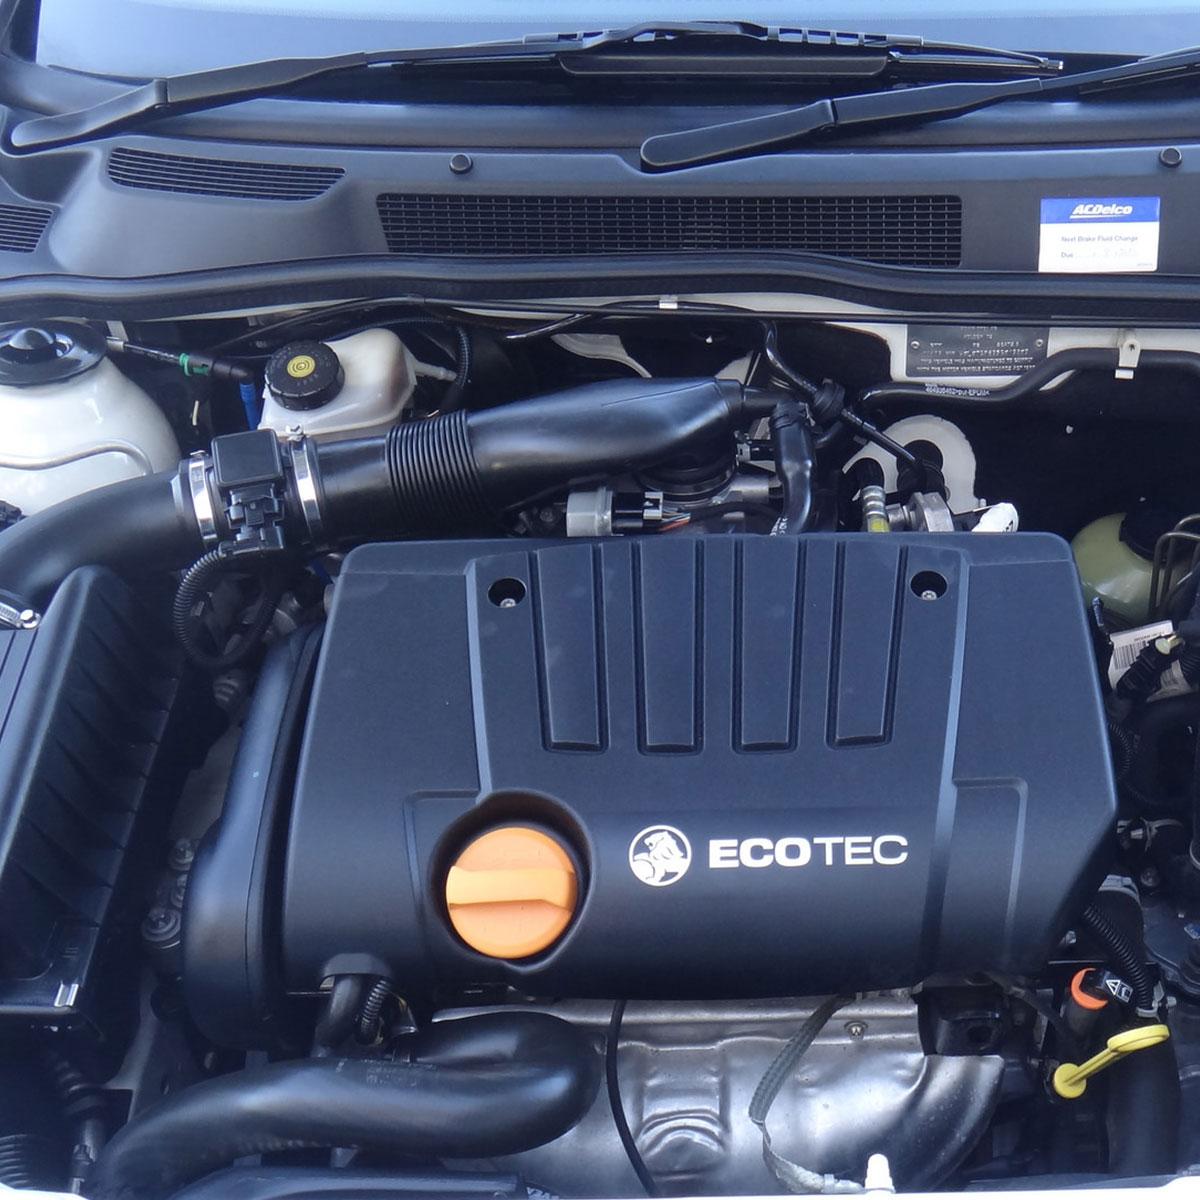 Rattle/noise from engine inspection | AutoGuru